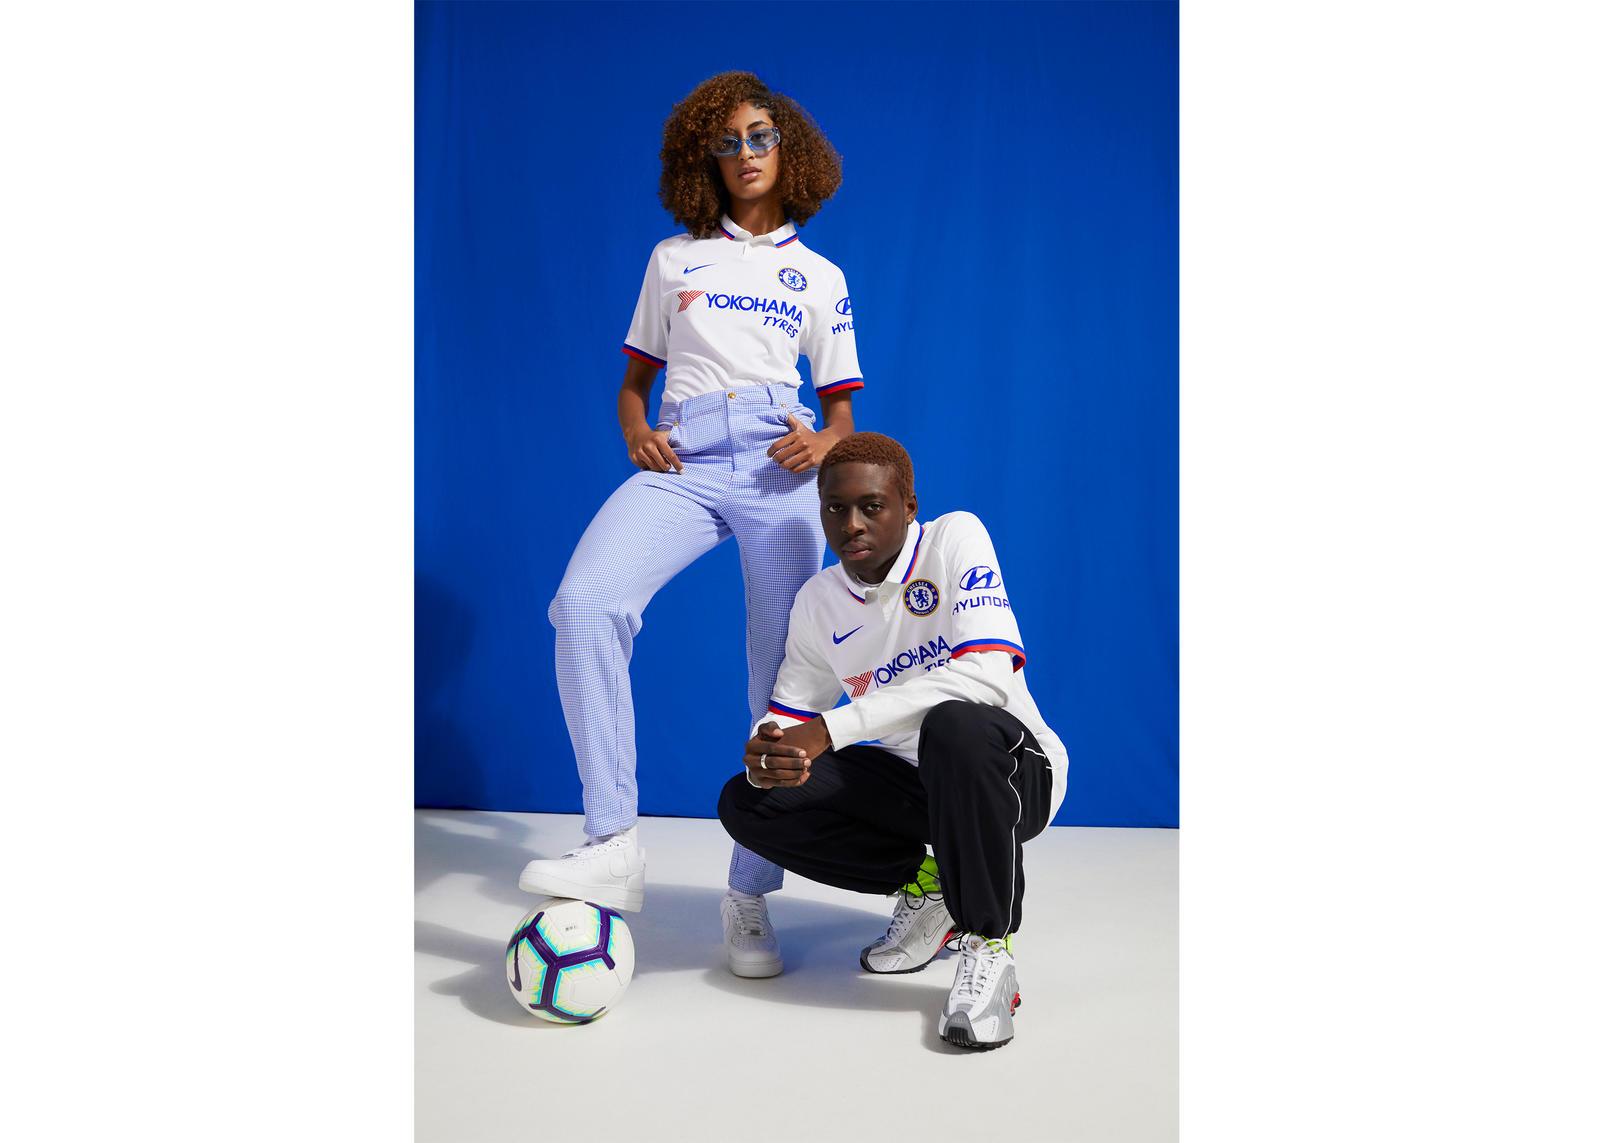 Chelsea-Away-Jersey-Nike-News-6_89134